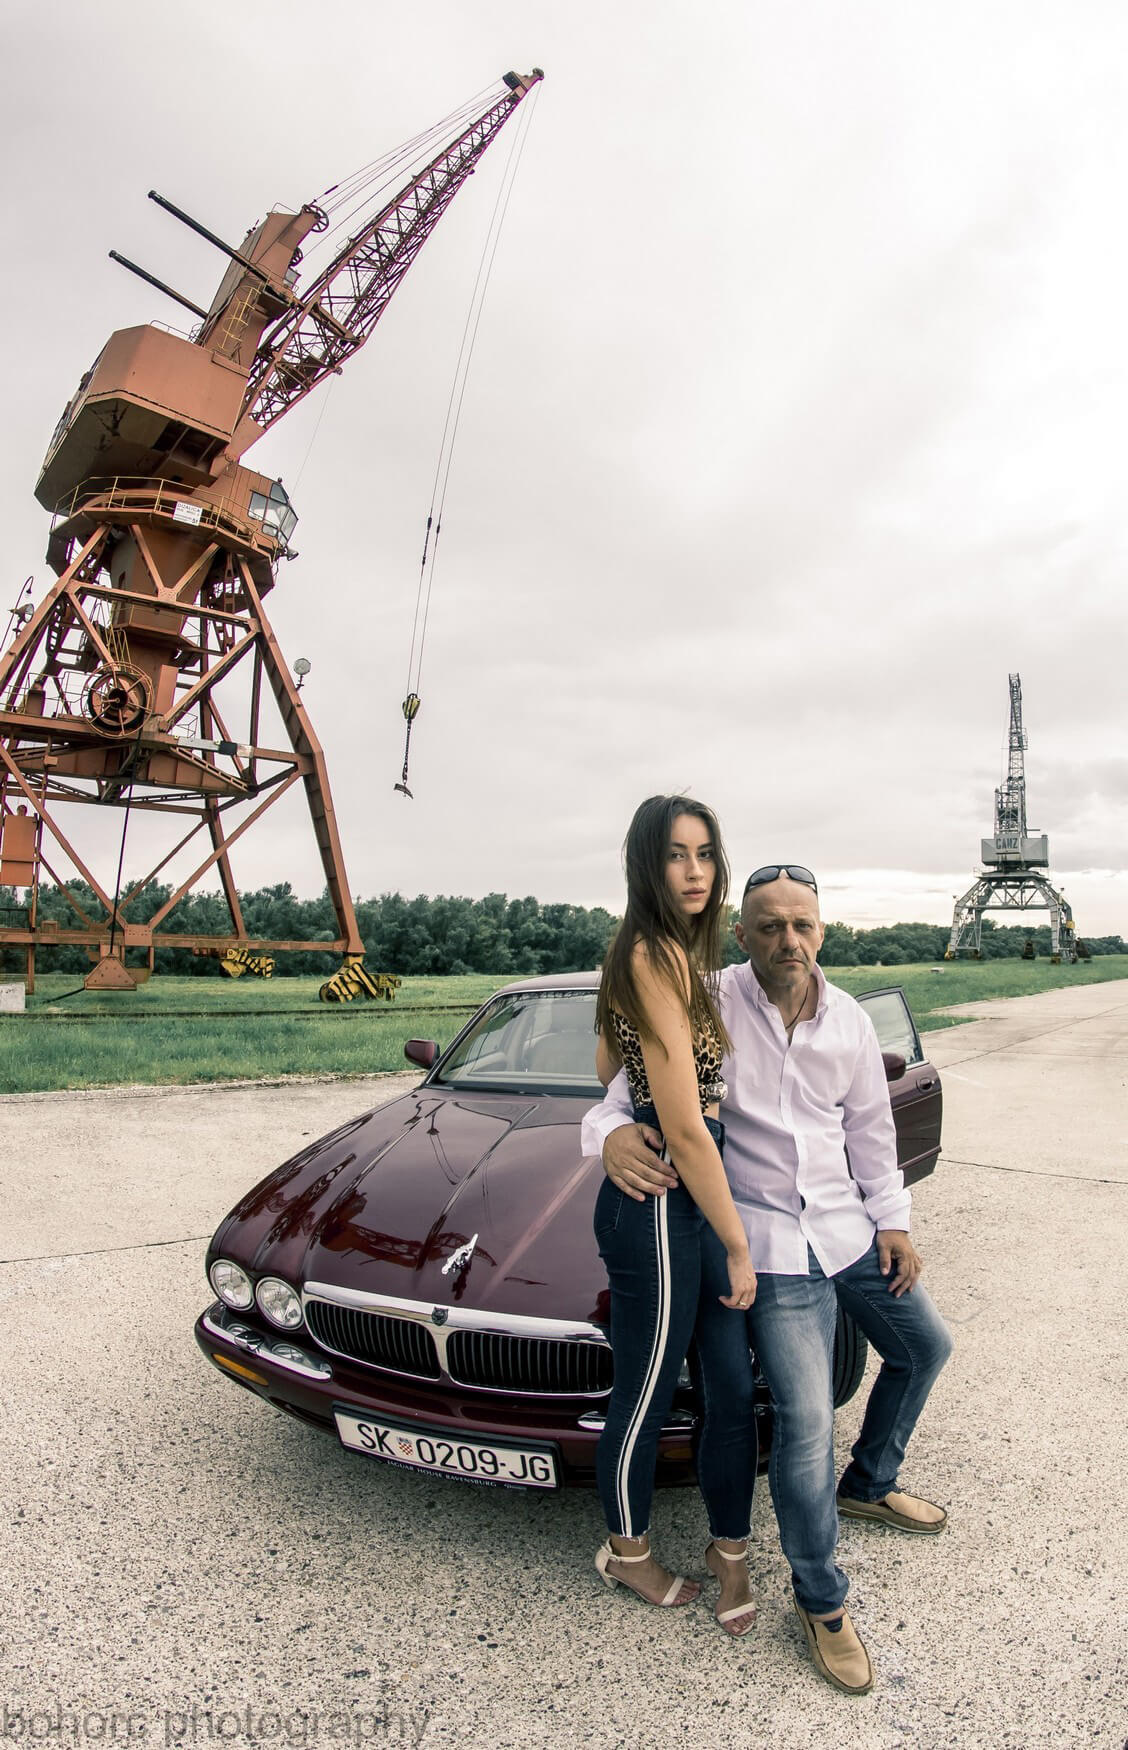 Autor-Bohorc-Ivica-Jerry-fotoshooting-Fotoklub-Sisak